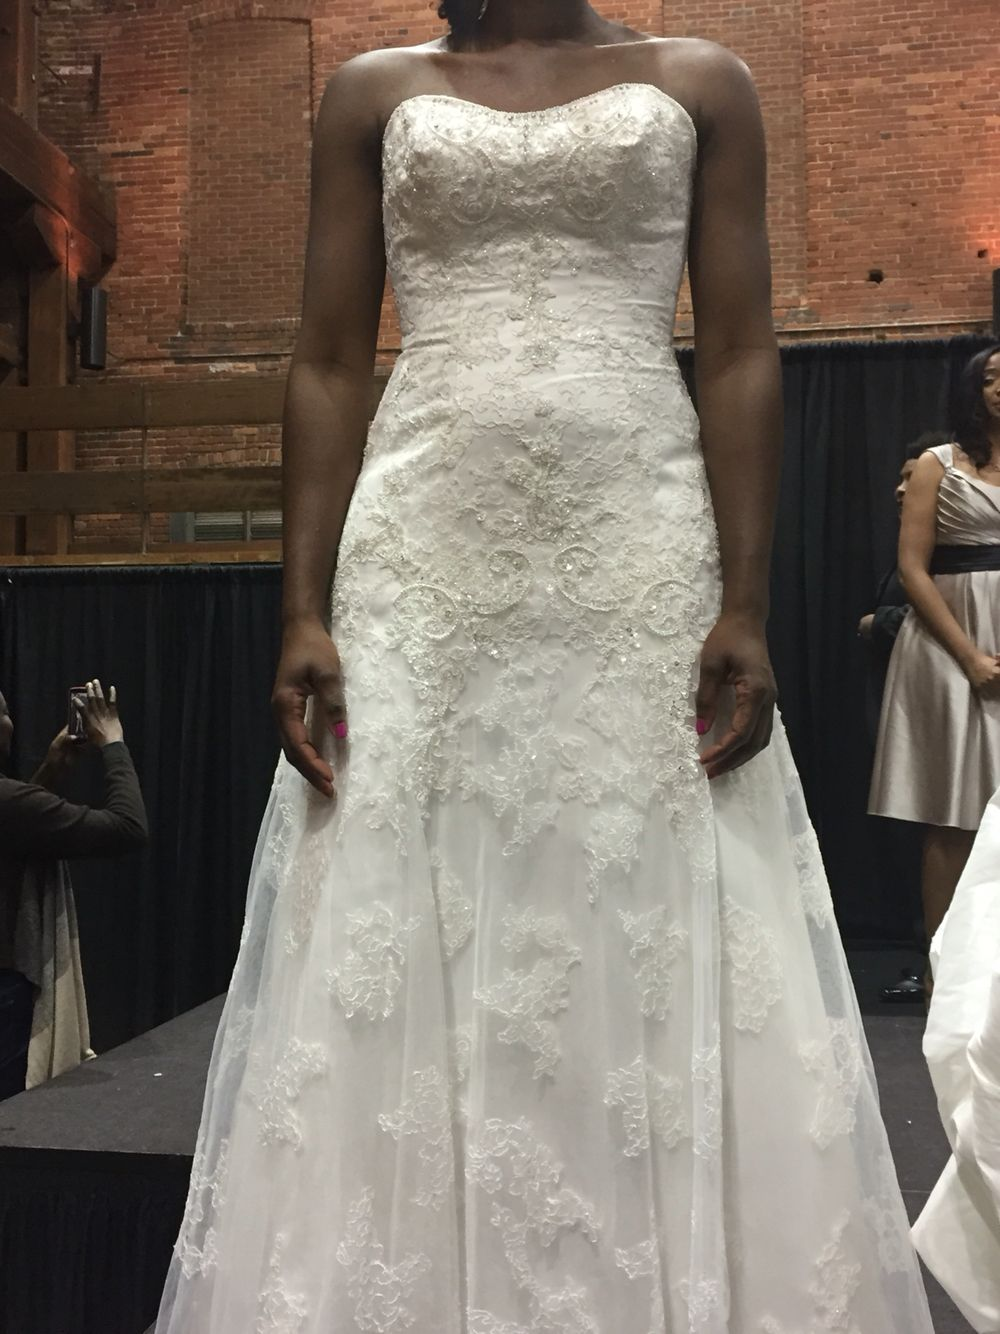 Daphneys Wedding Gown Wedding Dresses Lace Lace Weddings Strapless Wedding Dress